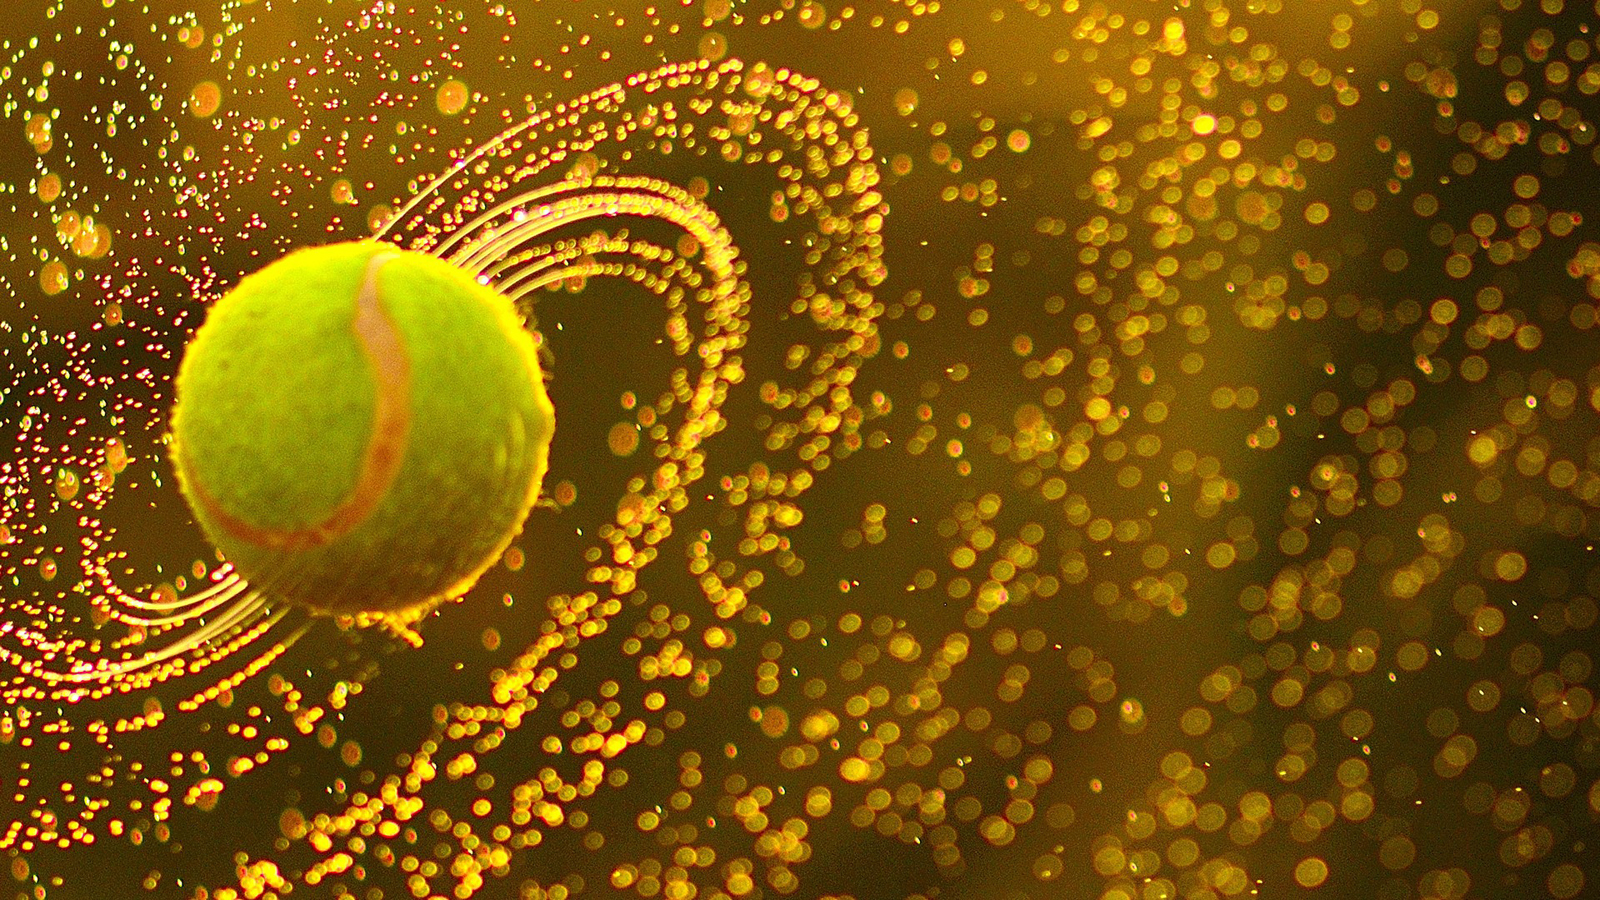 48 Tennis Wallpapers Hd On Wallpapersafari